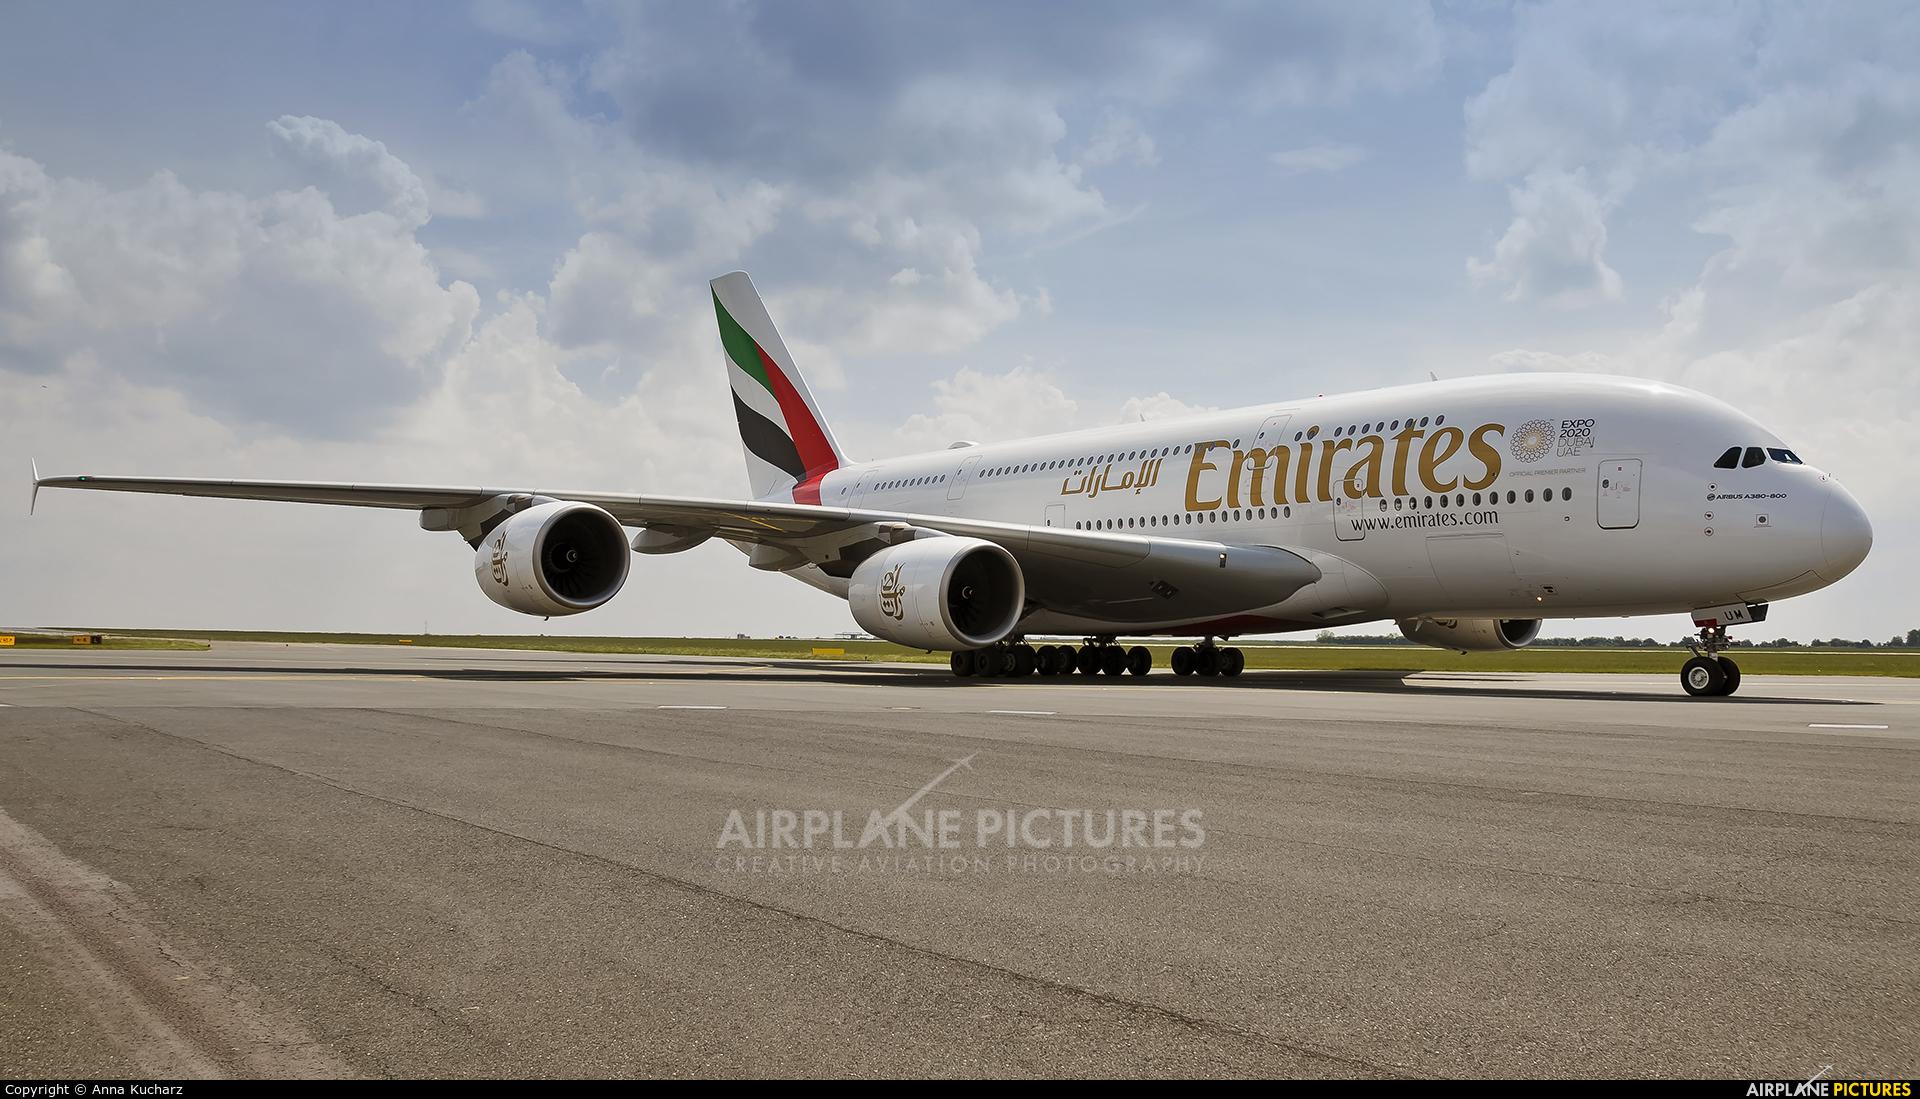 Emirates Airlines A6-EUM aircraft at Prague - Václav Havel